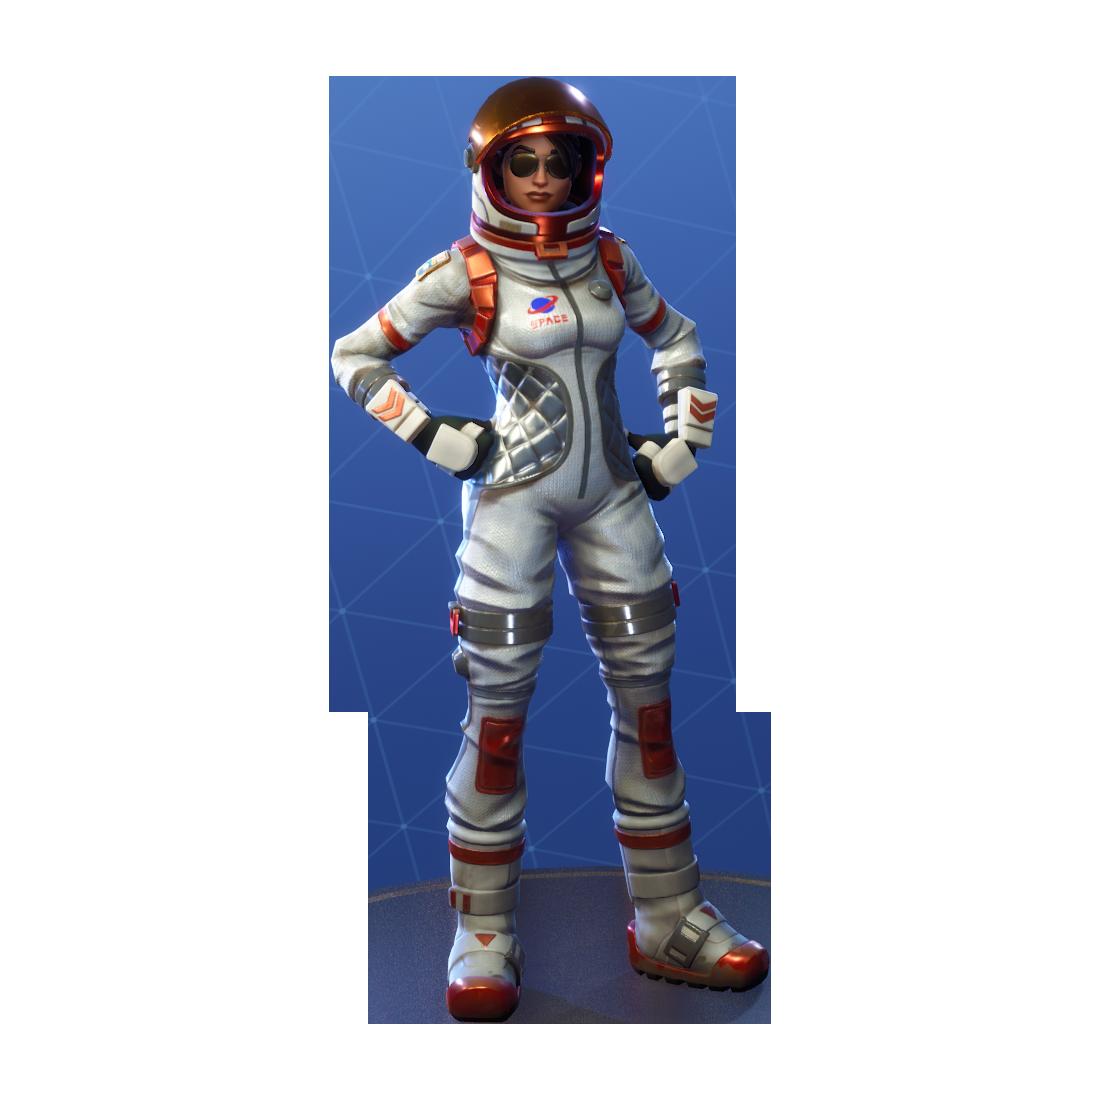 Moonwalker - Лунная программа (Moonwalker)